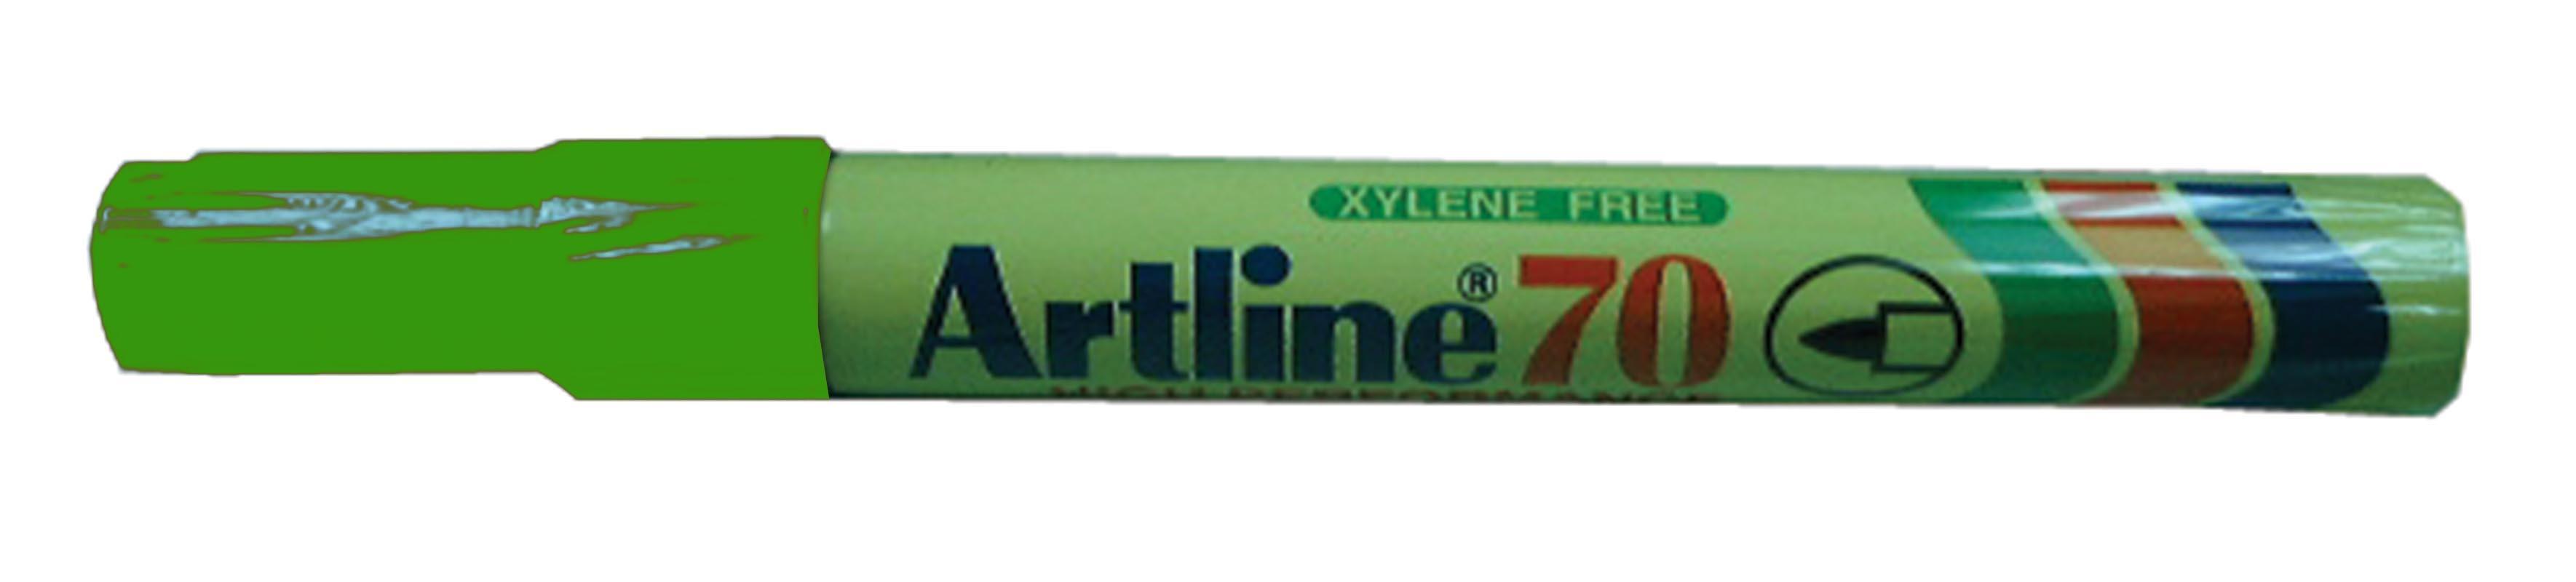 Next Artline ΕΚ90 μαρκαδόρος ανεξίτηλος πράσινος 12206-0571-2